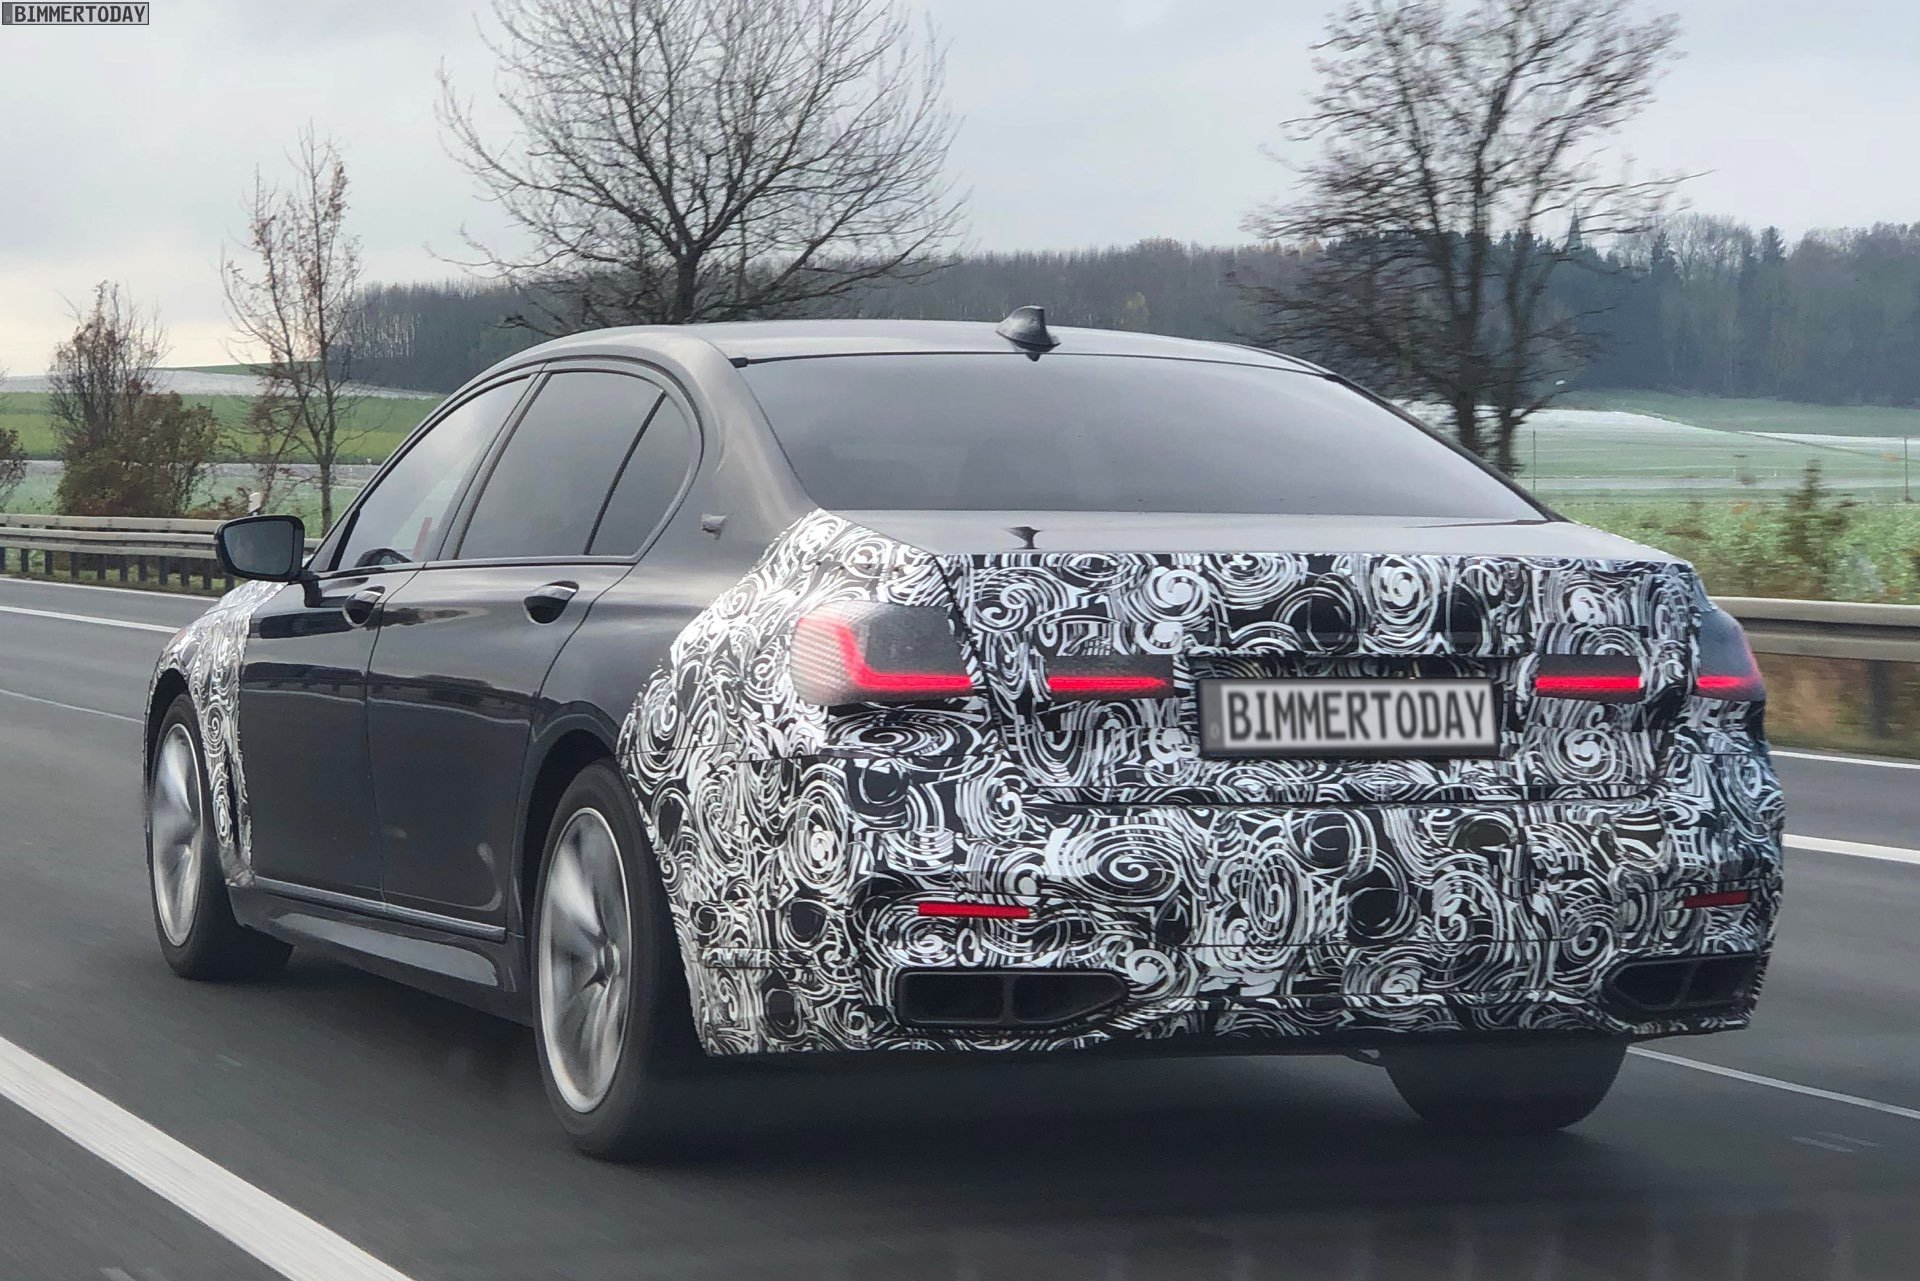 2019 BMW 7er Facelift G12 LCI G11 Erlkoenig Spyshots 02